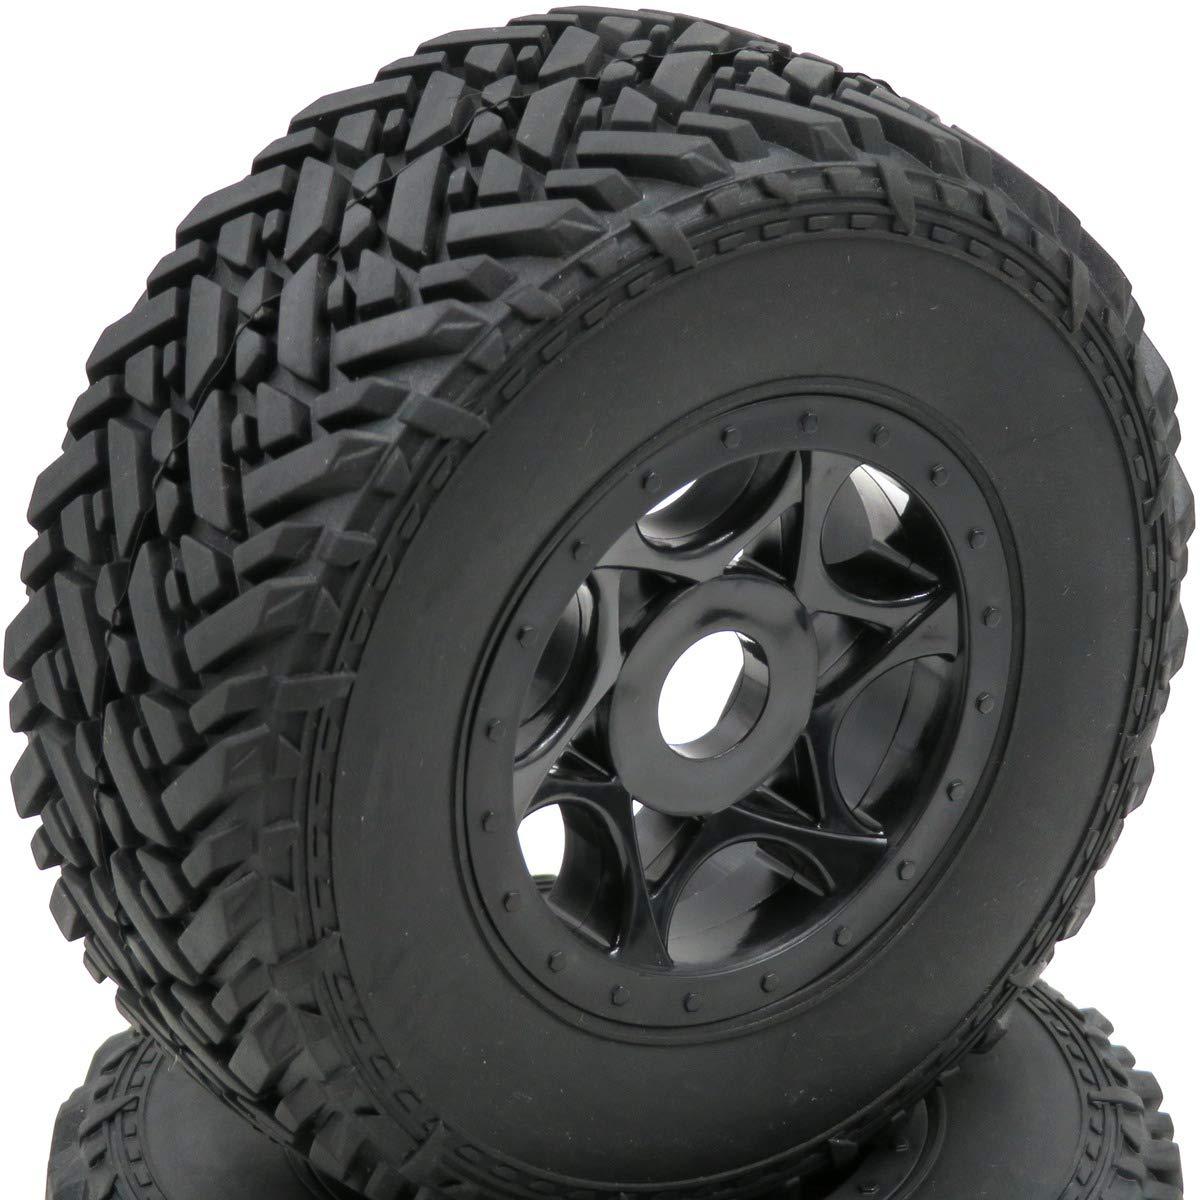 4pcs RC 1//8 Buggy Off Road Short Course Tires /& Hex 17mm Wheels Rims For 1:8 Car